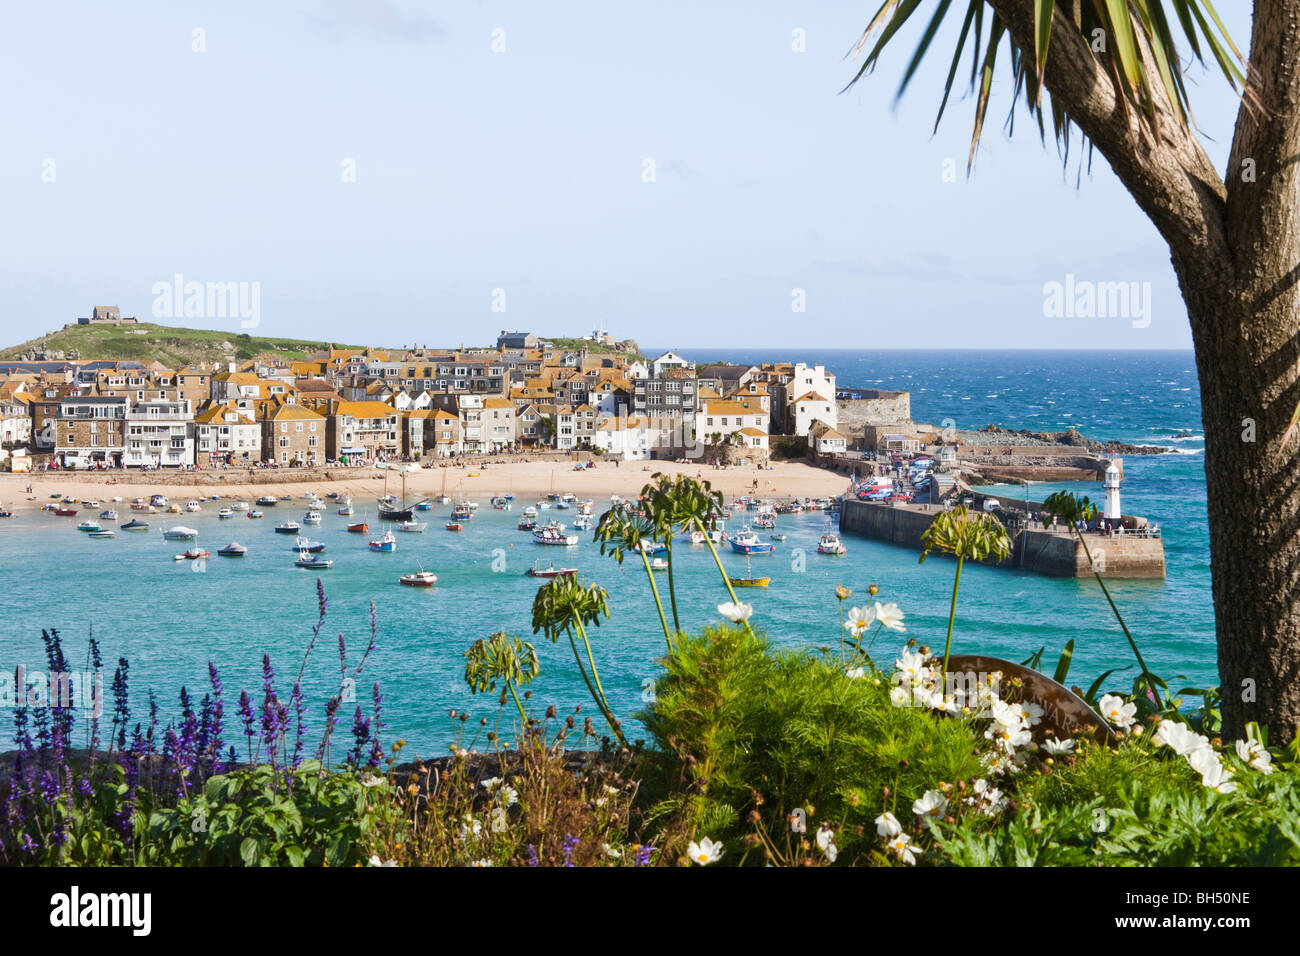 The popular seaside resort of St Ives, Cornwall - Stock Image